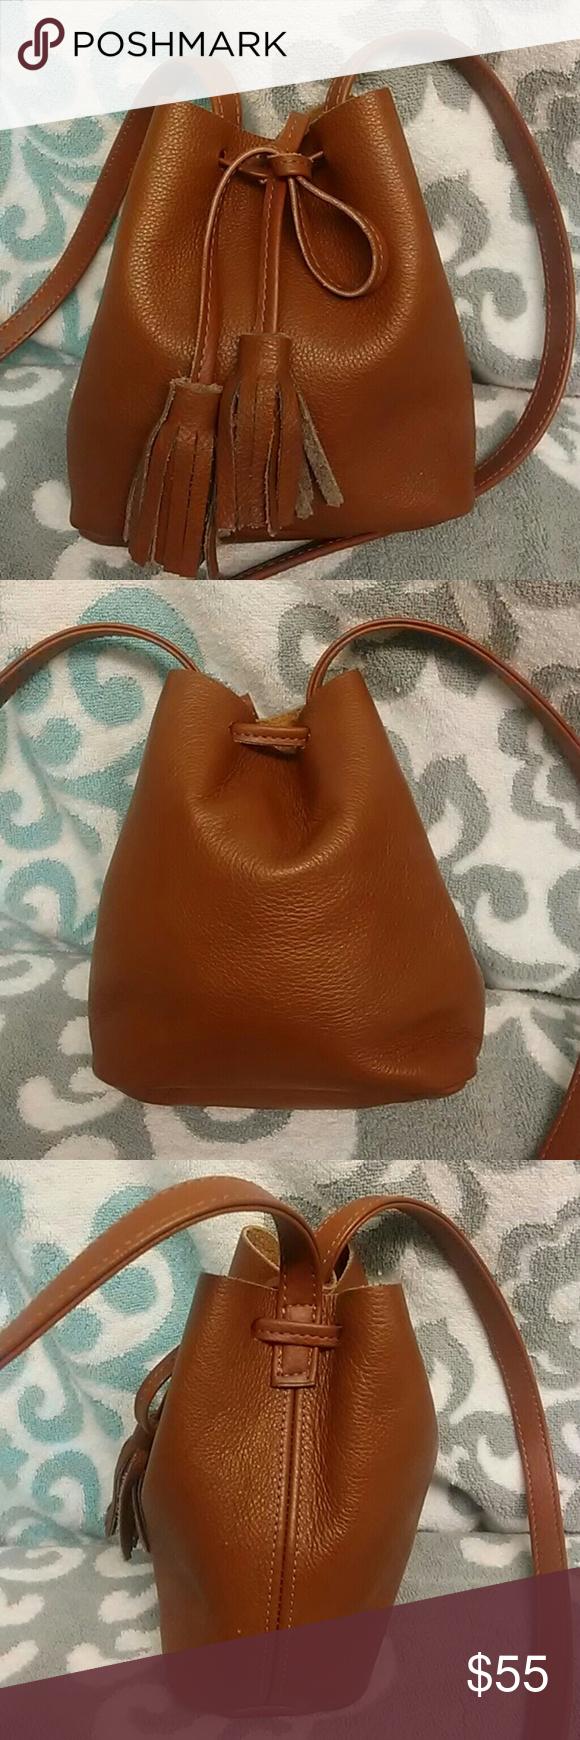 Shaffer Los Angeles Leather Bucket Bag Rachael Zoe